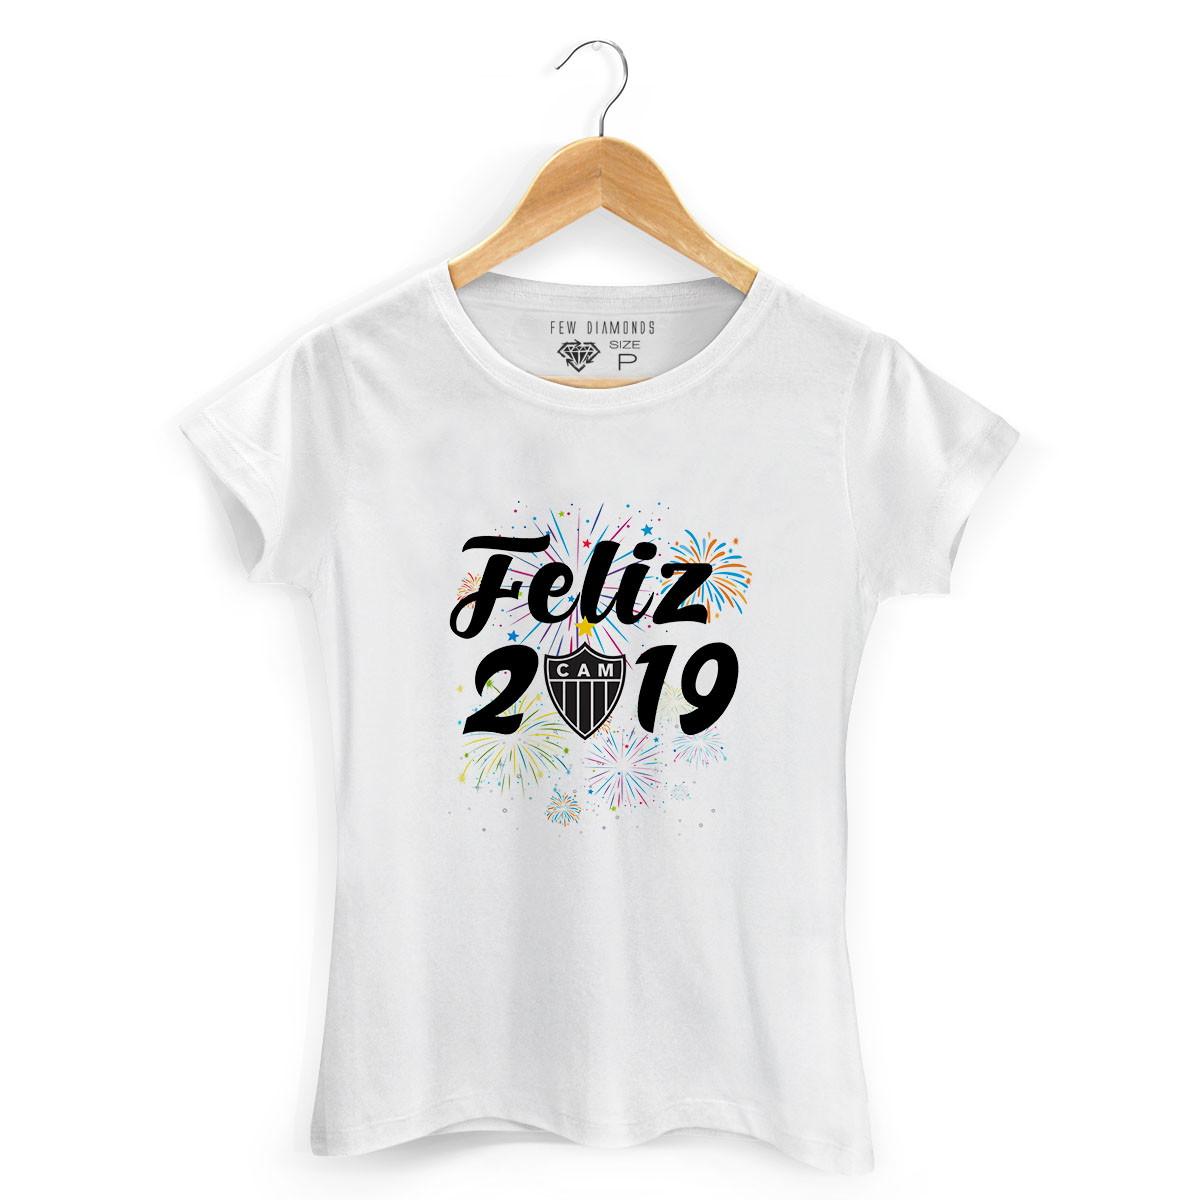 3f33c0bf37 Camiseta Feminina Feliz 2019 Time Atlético Mineiro Camisa no Elo7 ...